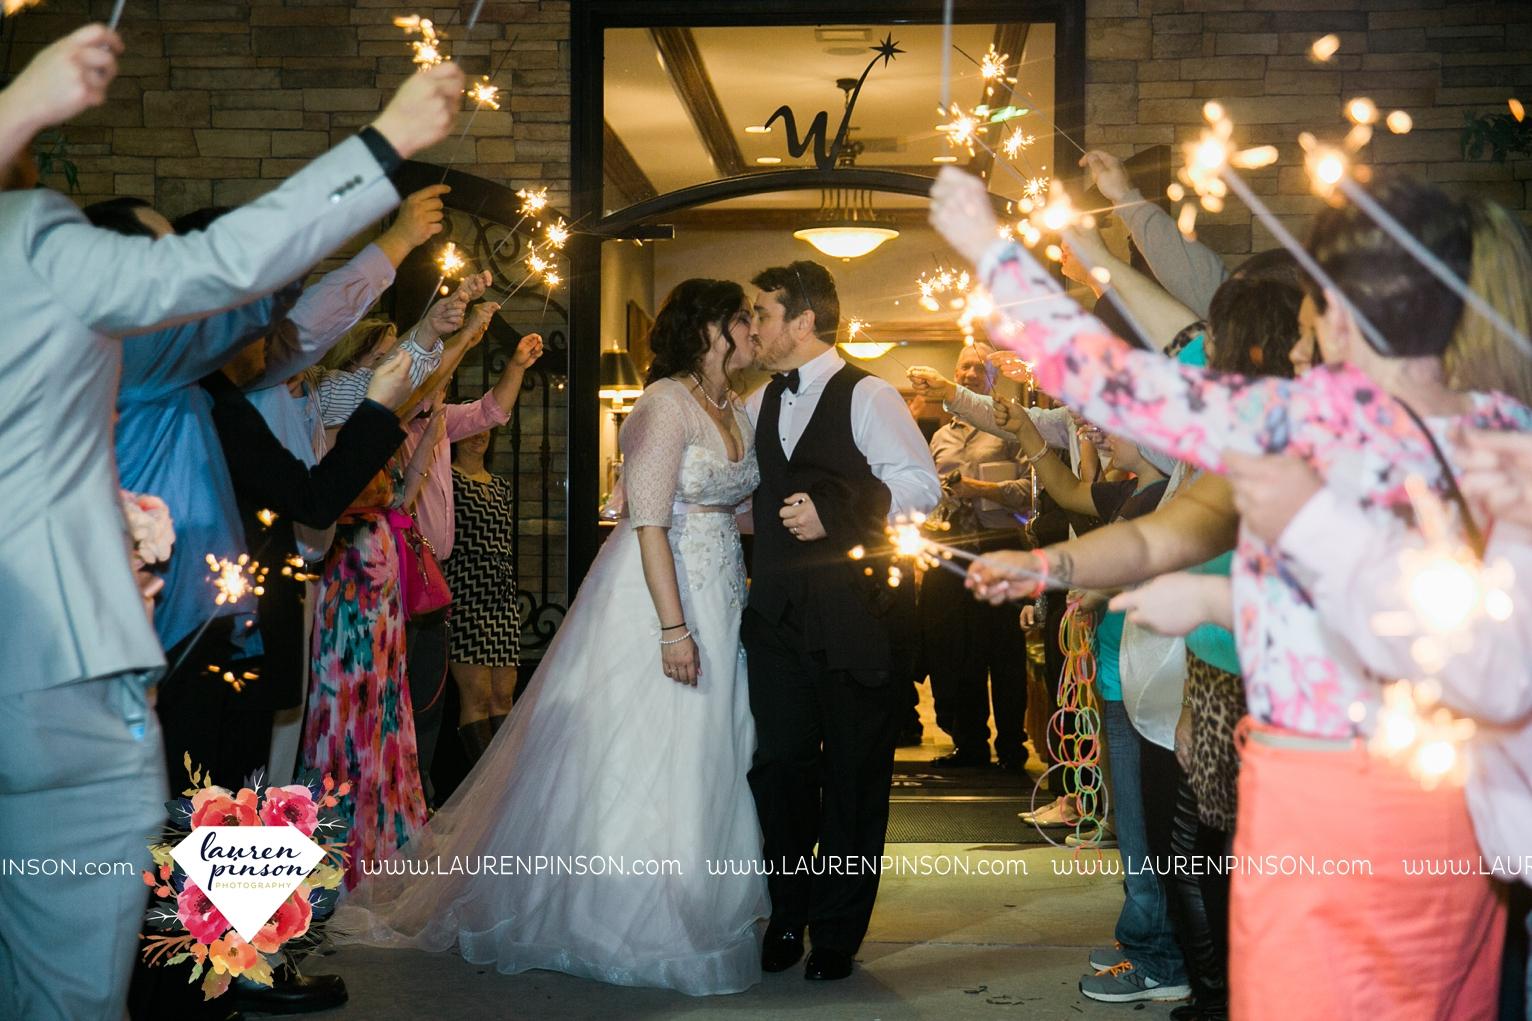 gainesville-texas-sherman-texas-thackerville-oklahoma-wedding-photographer-at-winstar-casino-golf-resort_2308.jpg